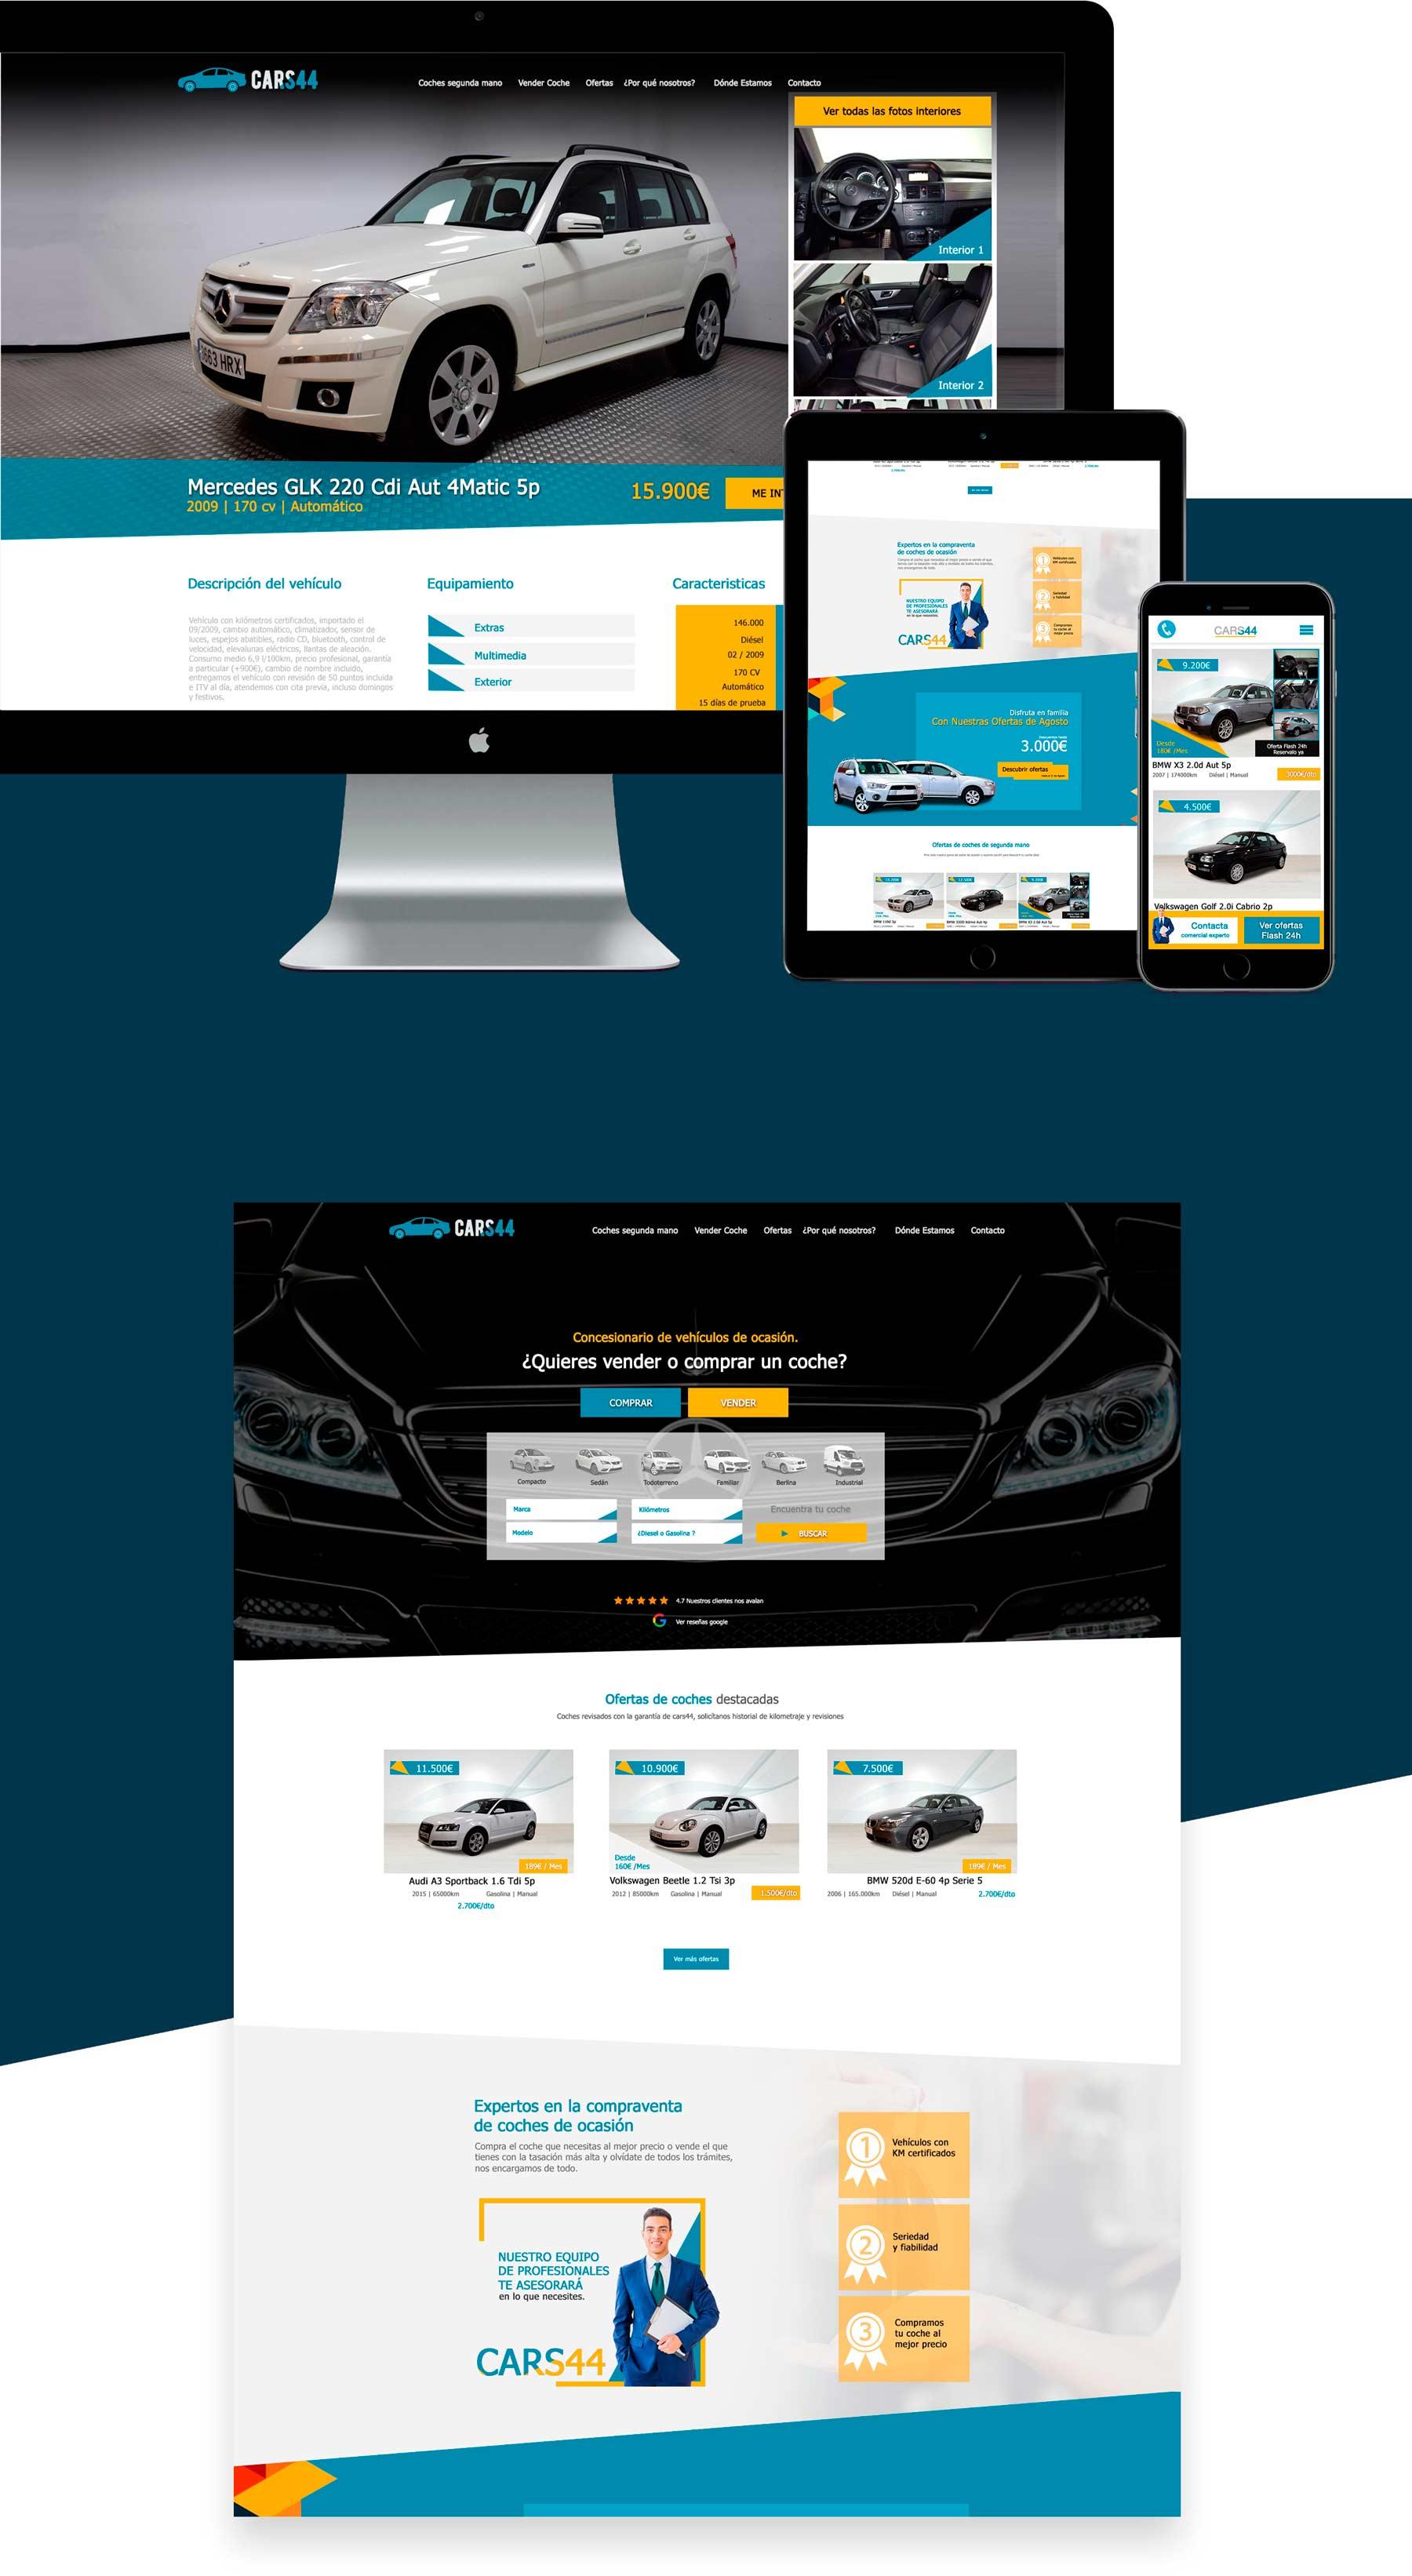 Diseño web a medida programación web Málaga Concesionario Automoción Málaga Madrid Barcelona Bilbao